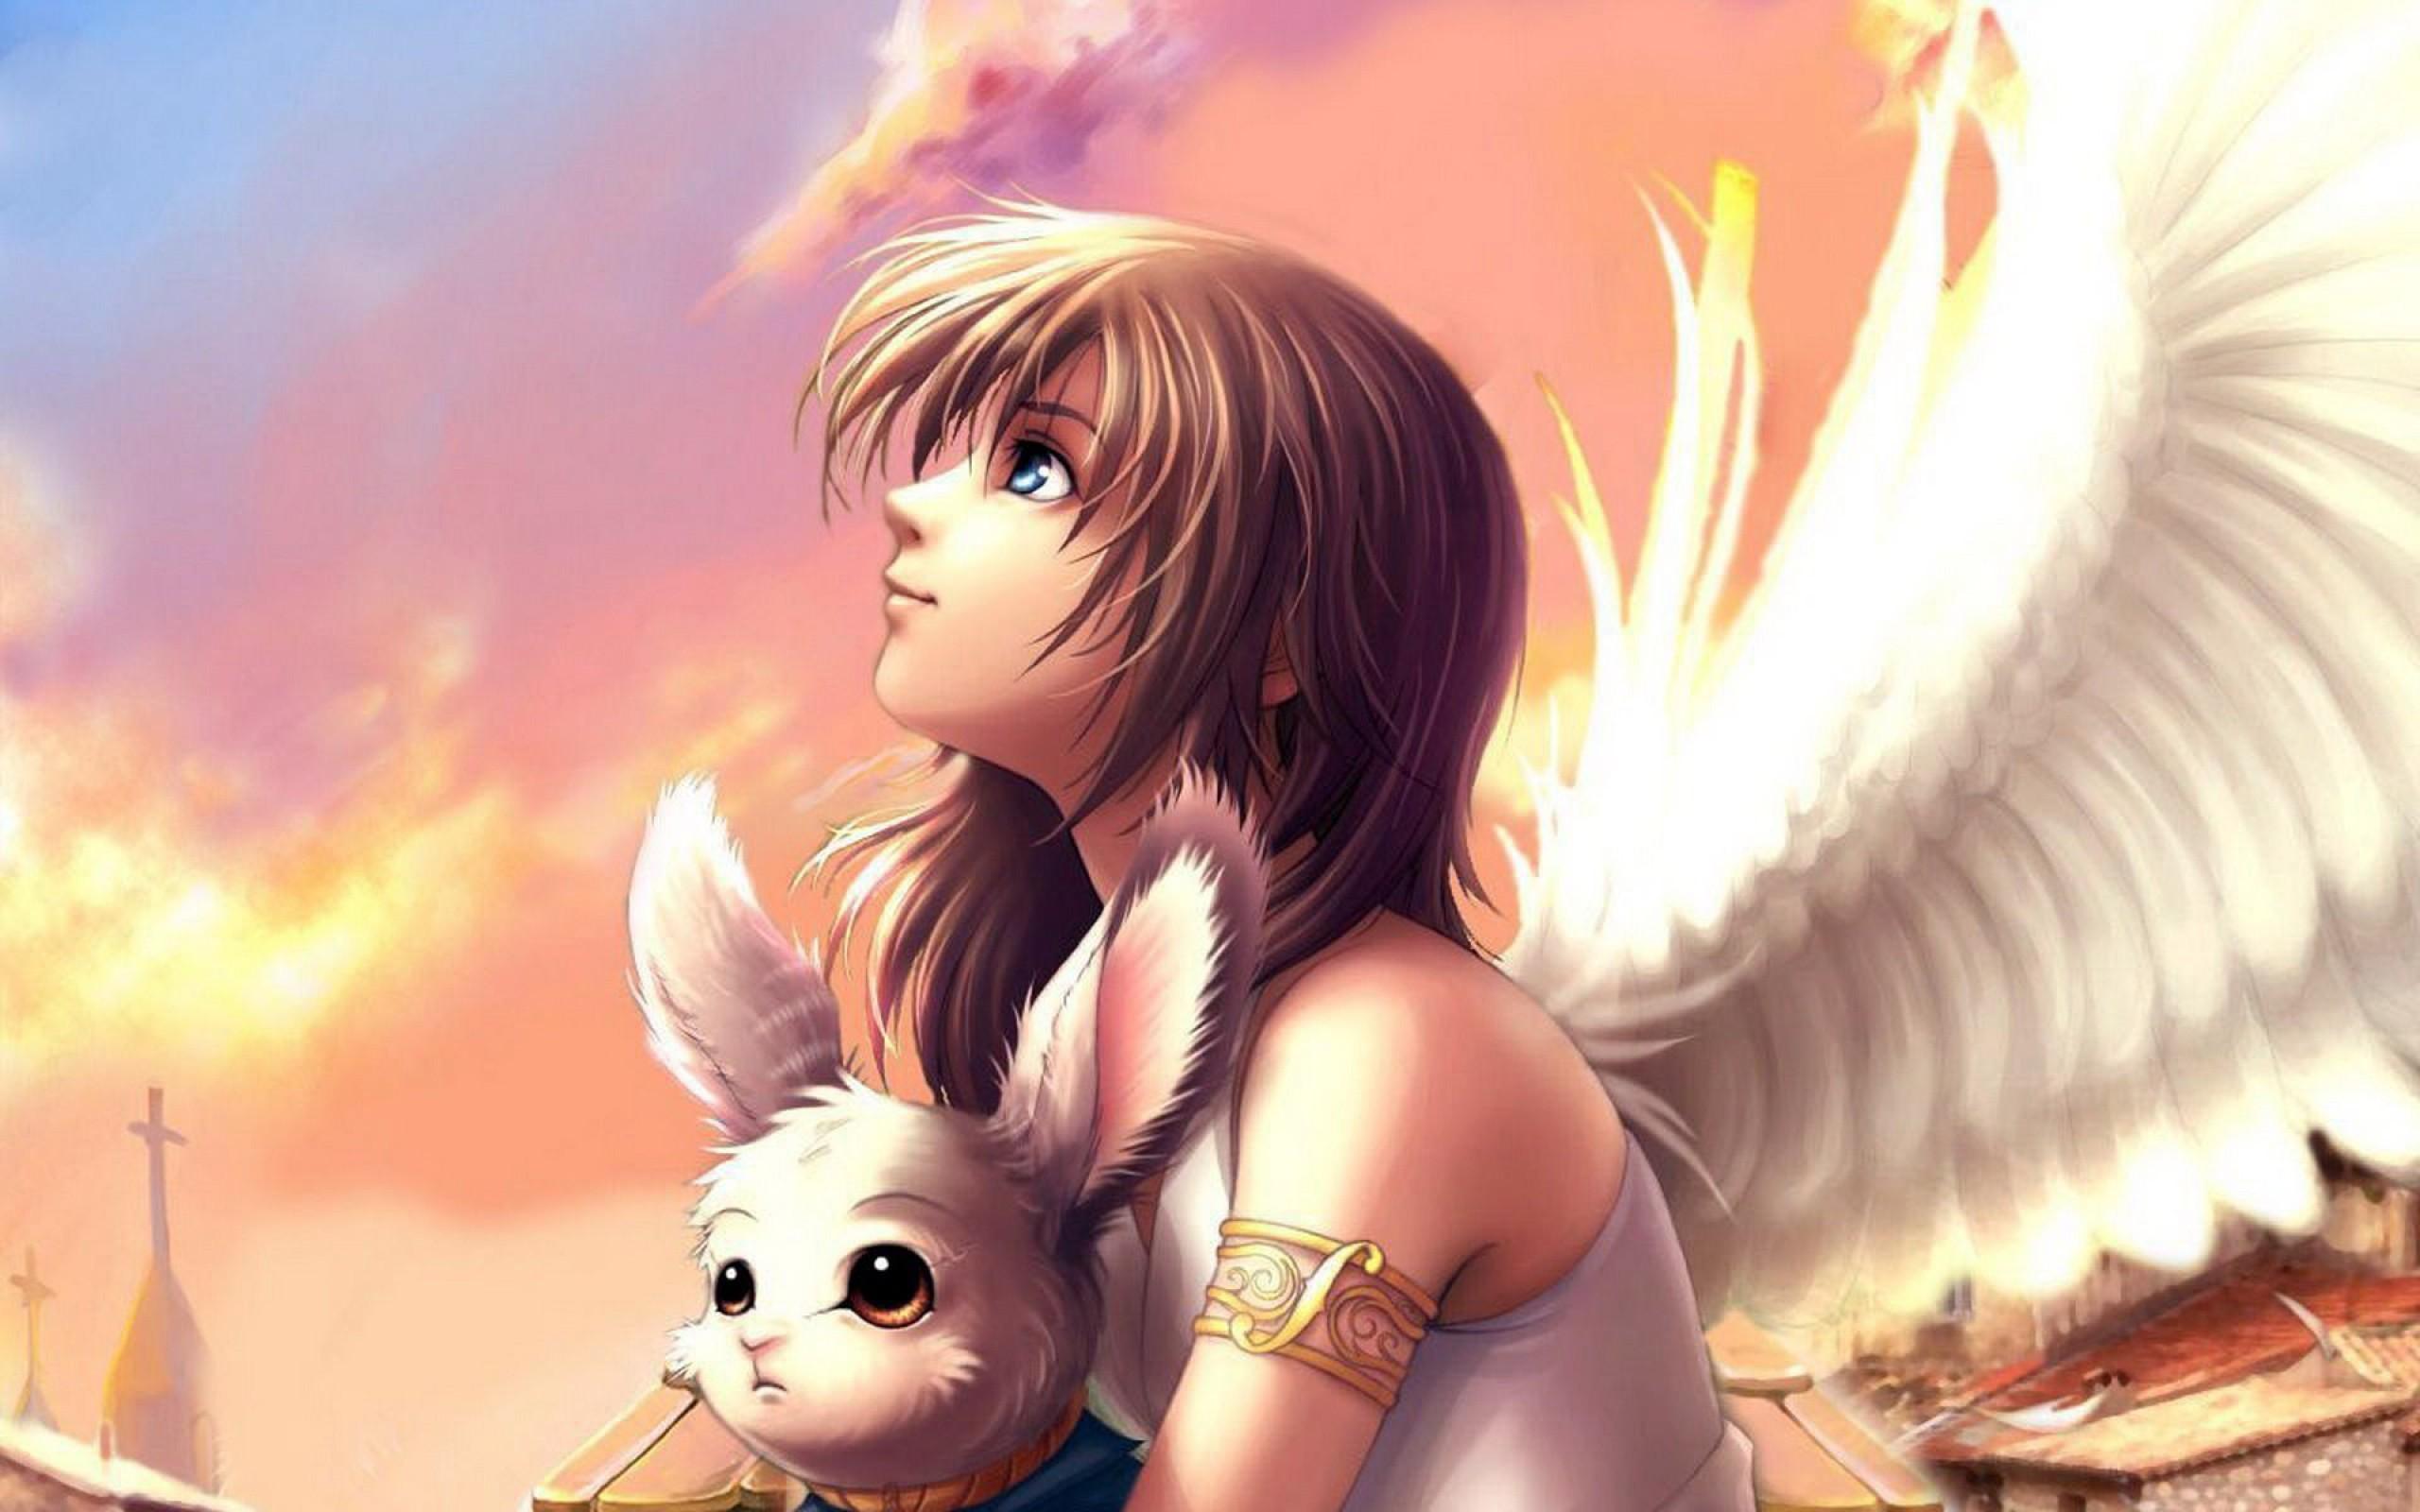 Anime angel wings wallpaper free desktop   Wallpapers, Backgrounds .